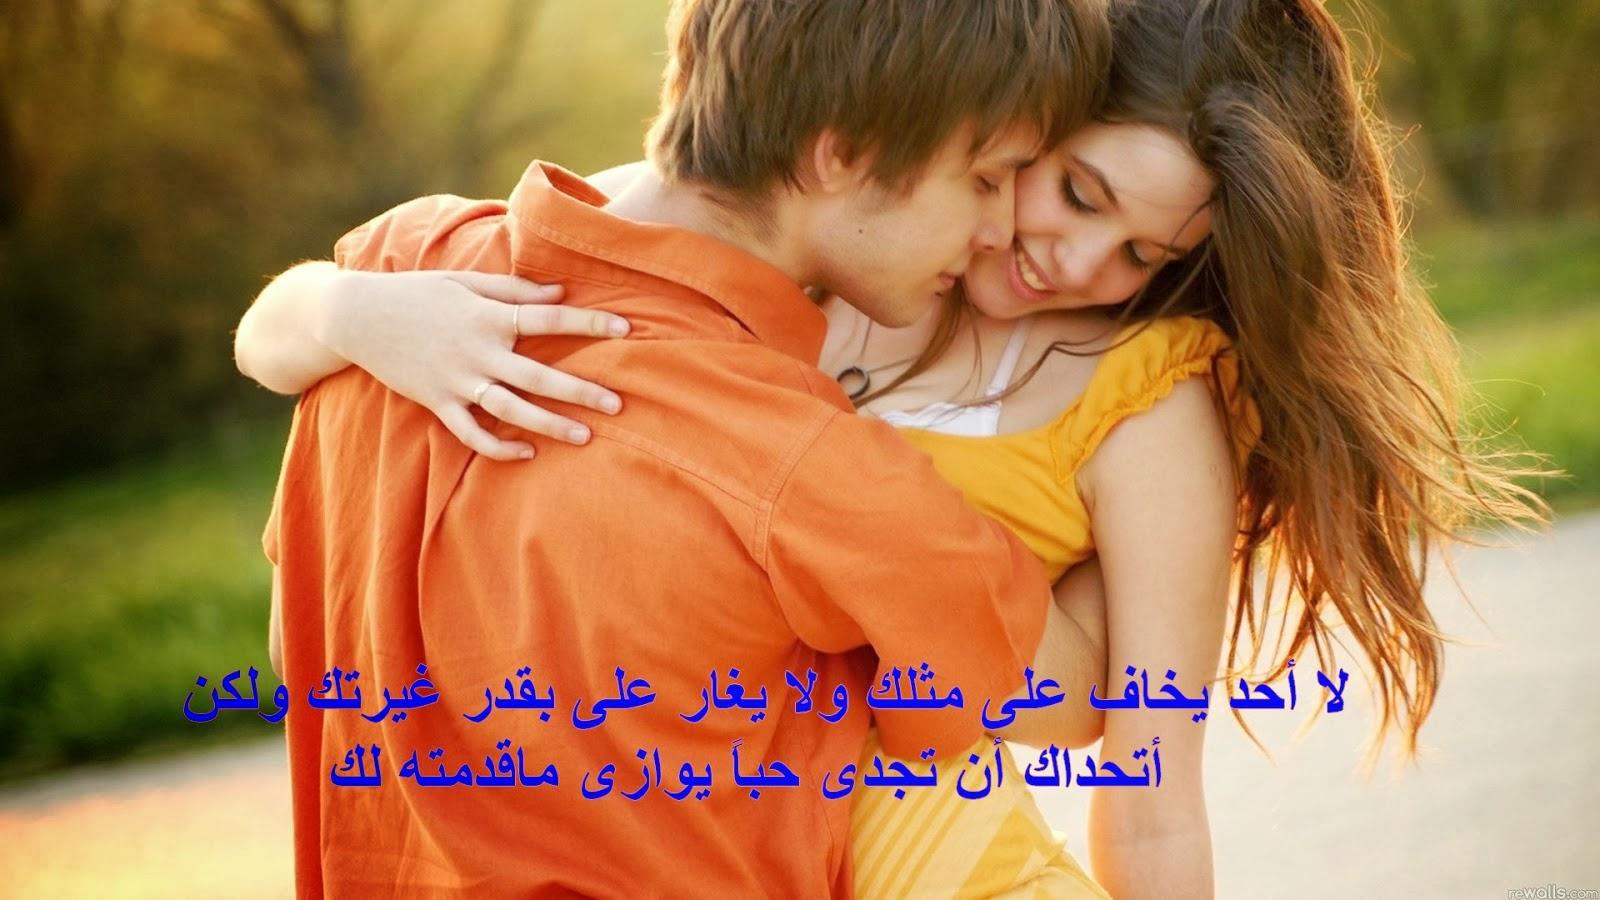 بالصور اجمل صور حب جديد , ارق مظاهر الحب unnamed file 63